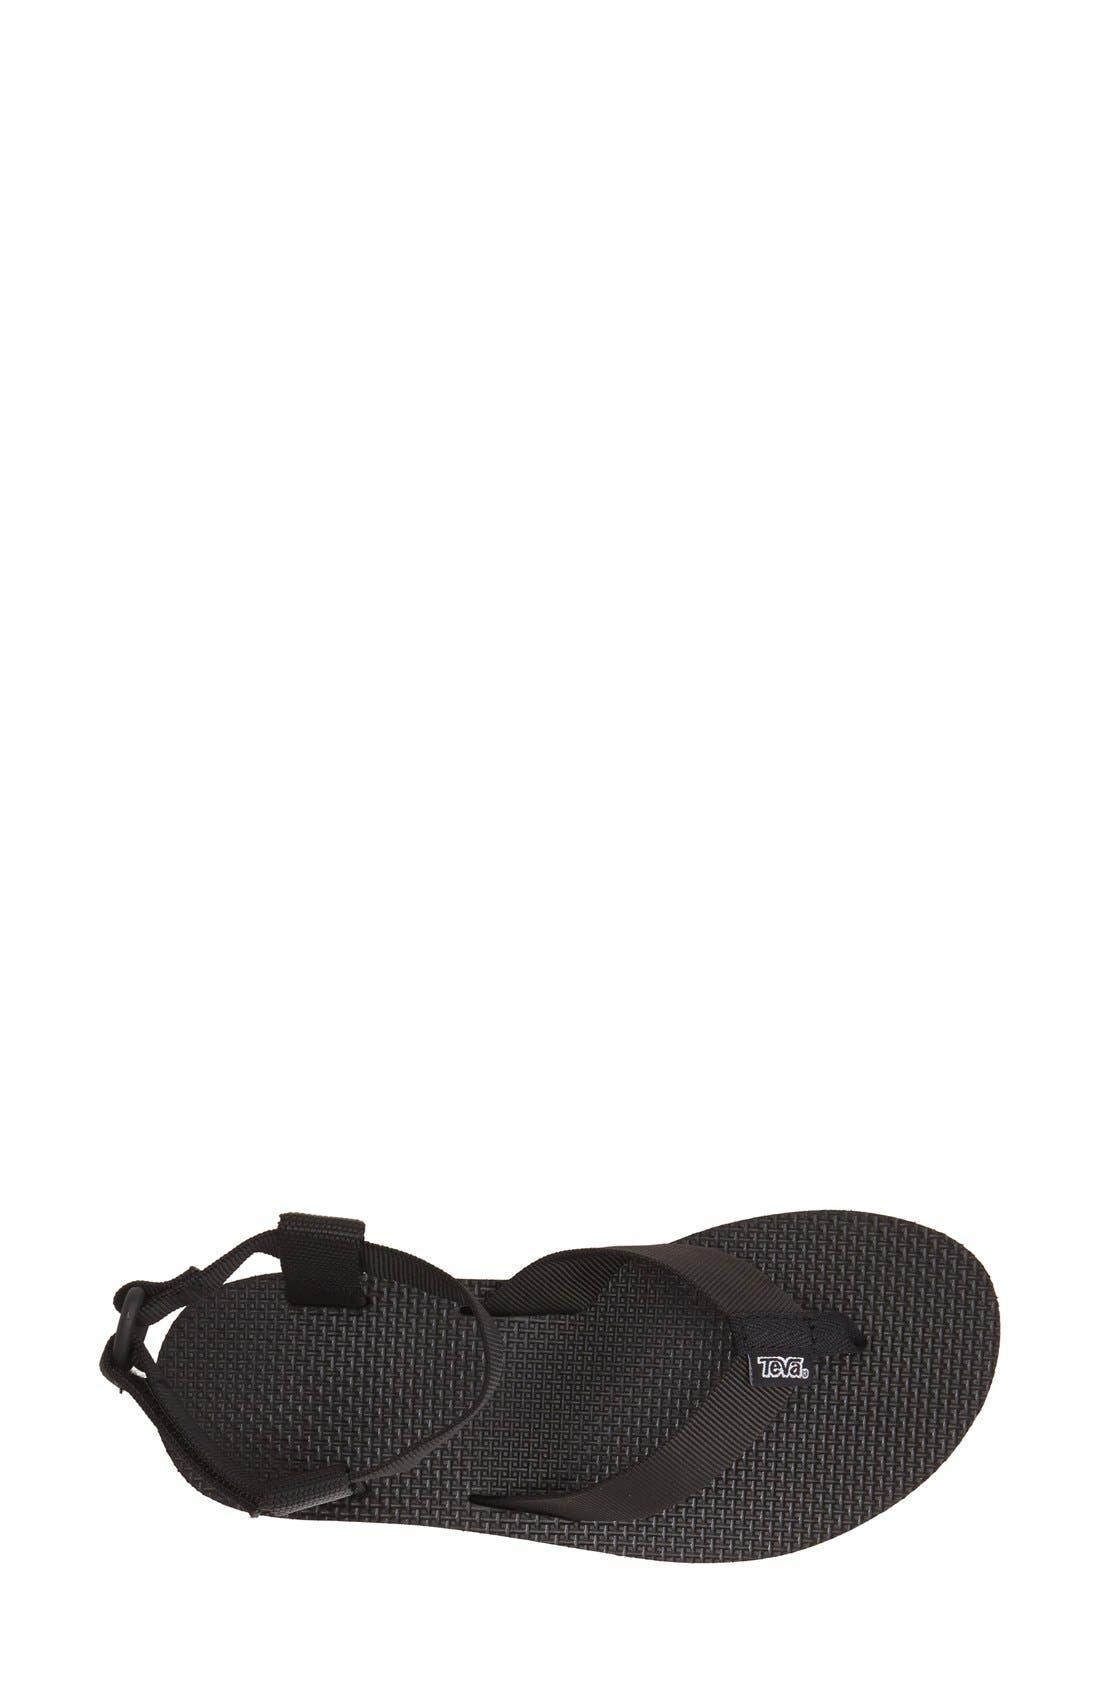 TEVA,                             'Original' Flatform Sandal,                             Alternate thumbnail 2, color,                             001